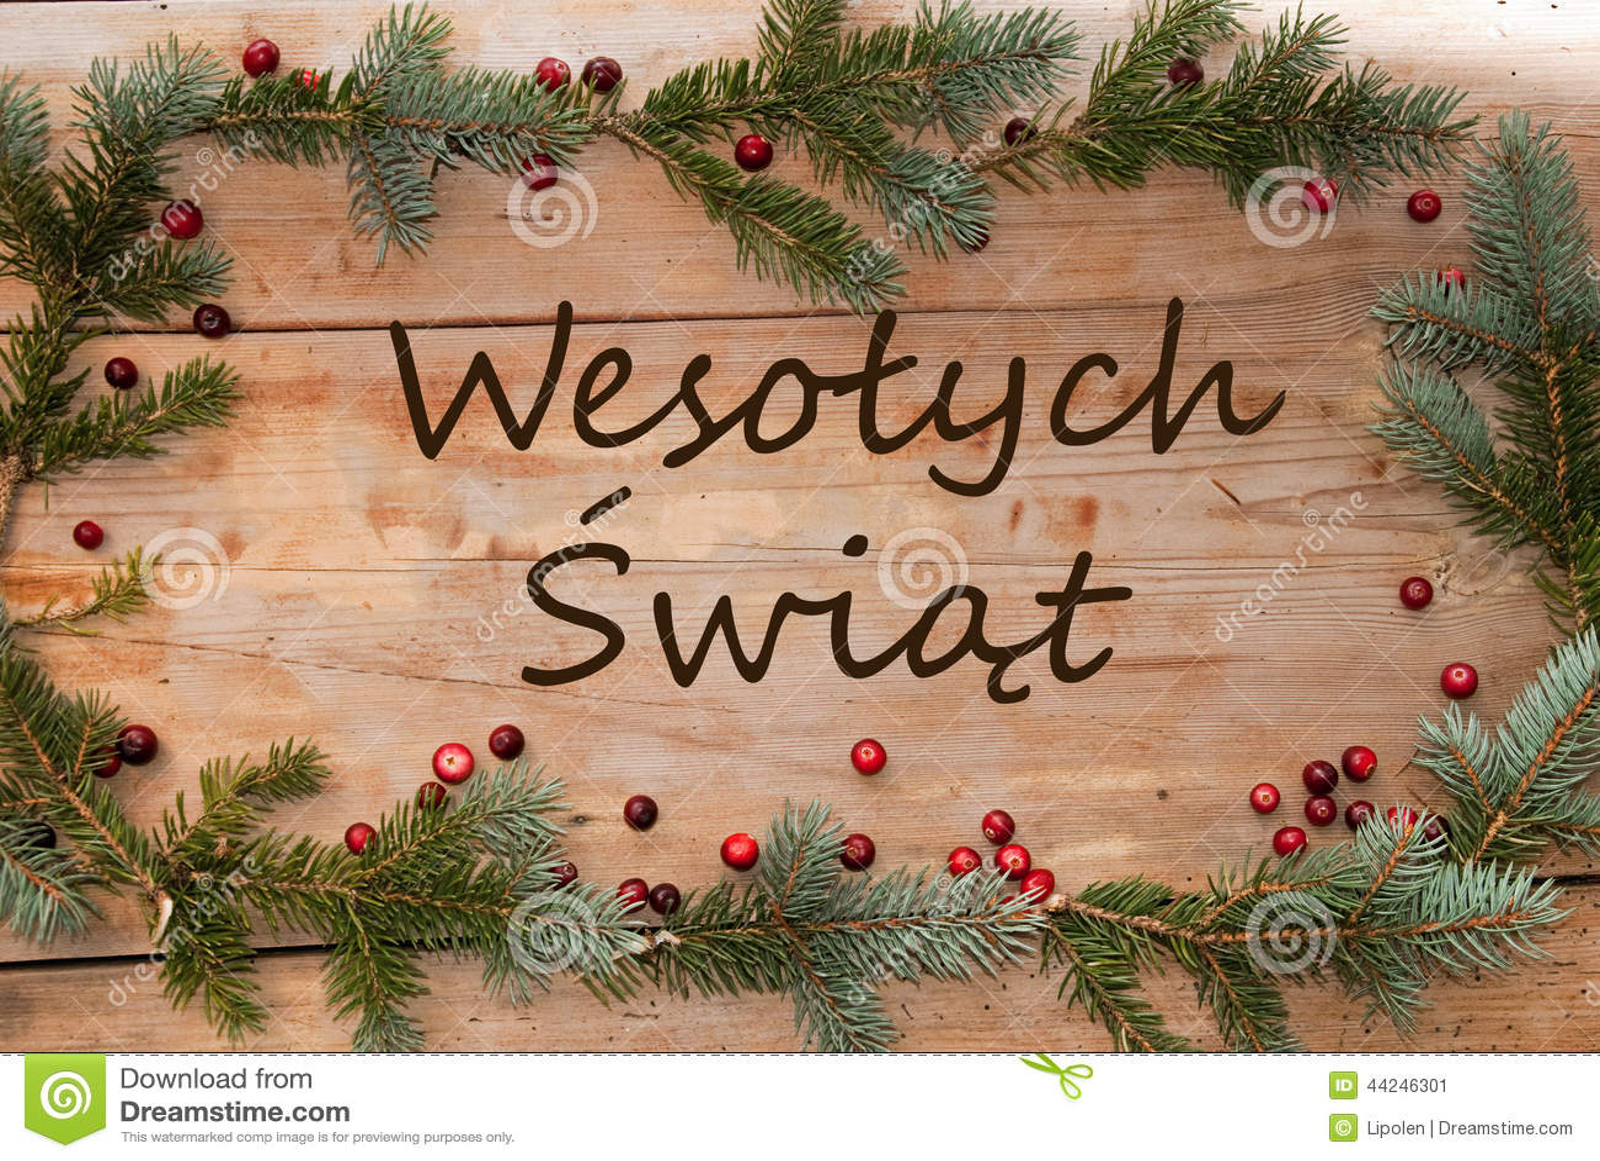 Merry christmas greetings stock image image of background 44246301 download merry christmas greetings stock image image of background 44246301 m4hsunfo